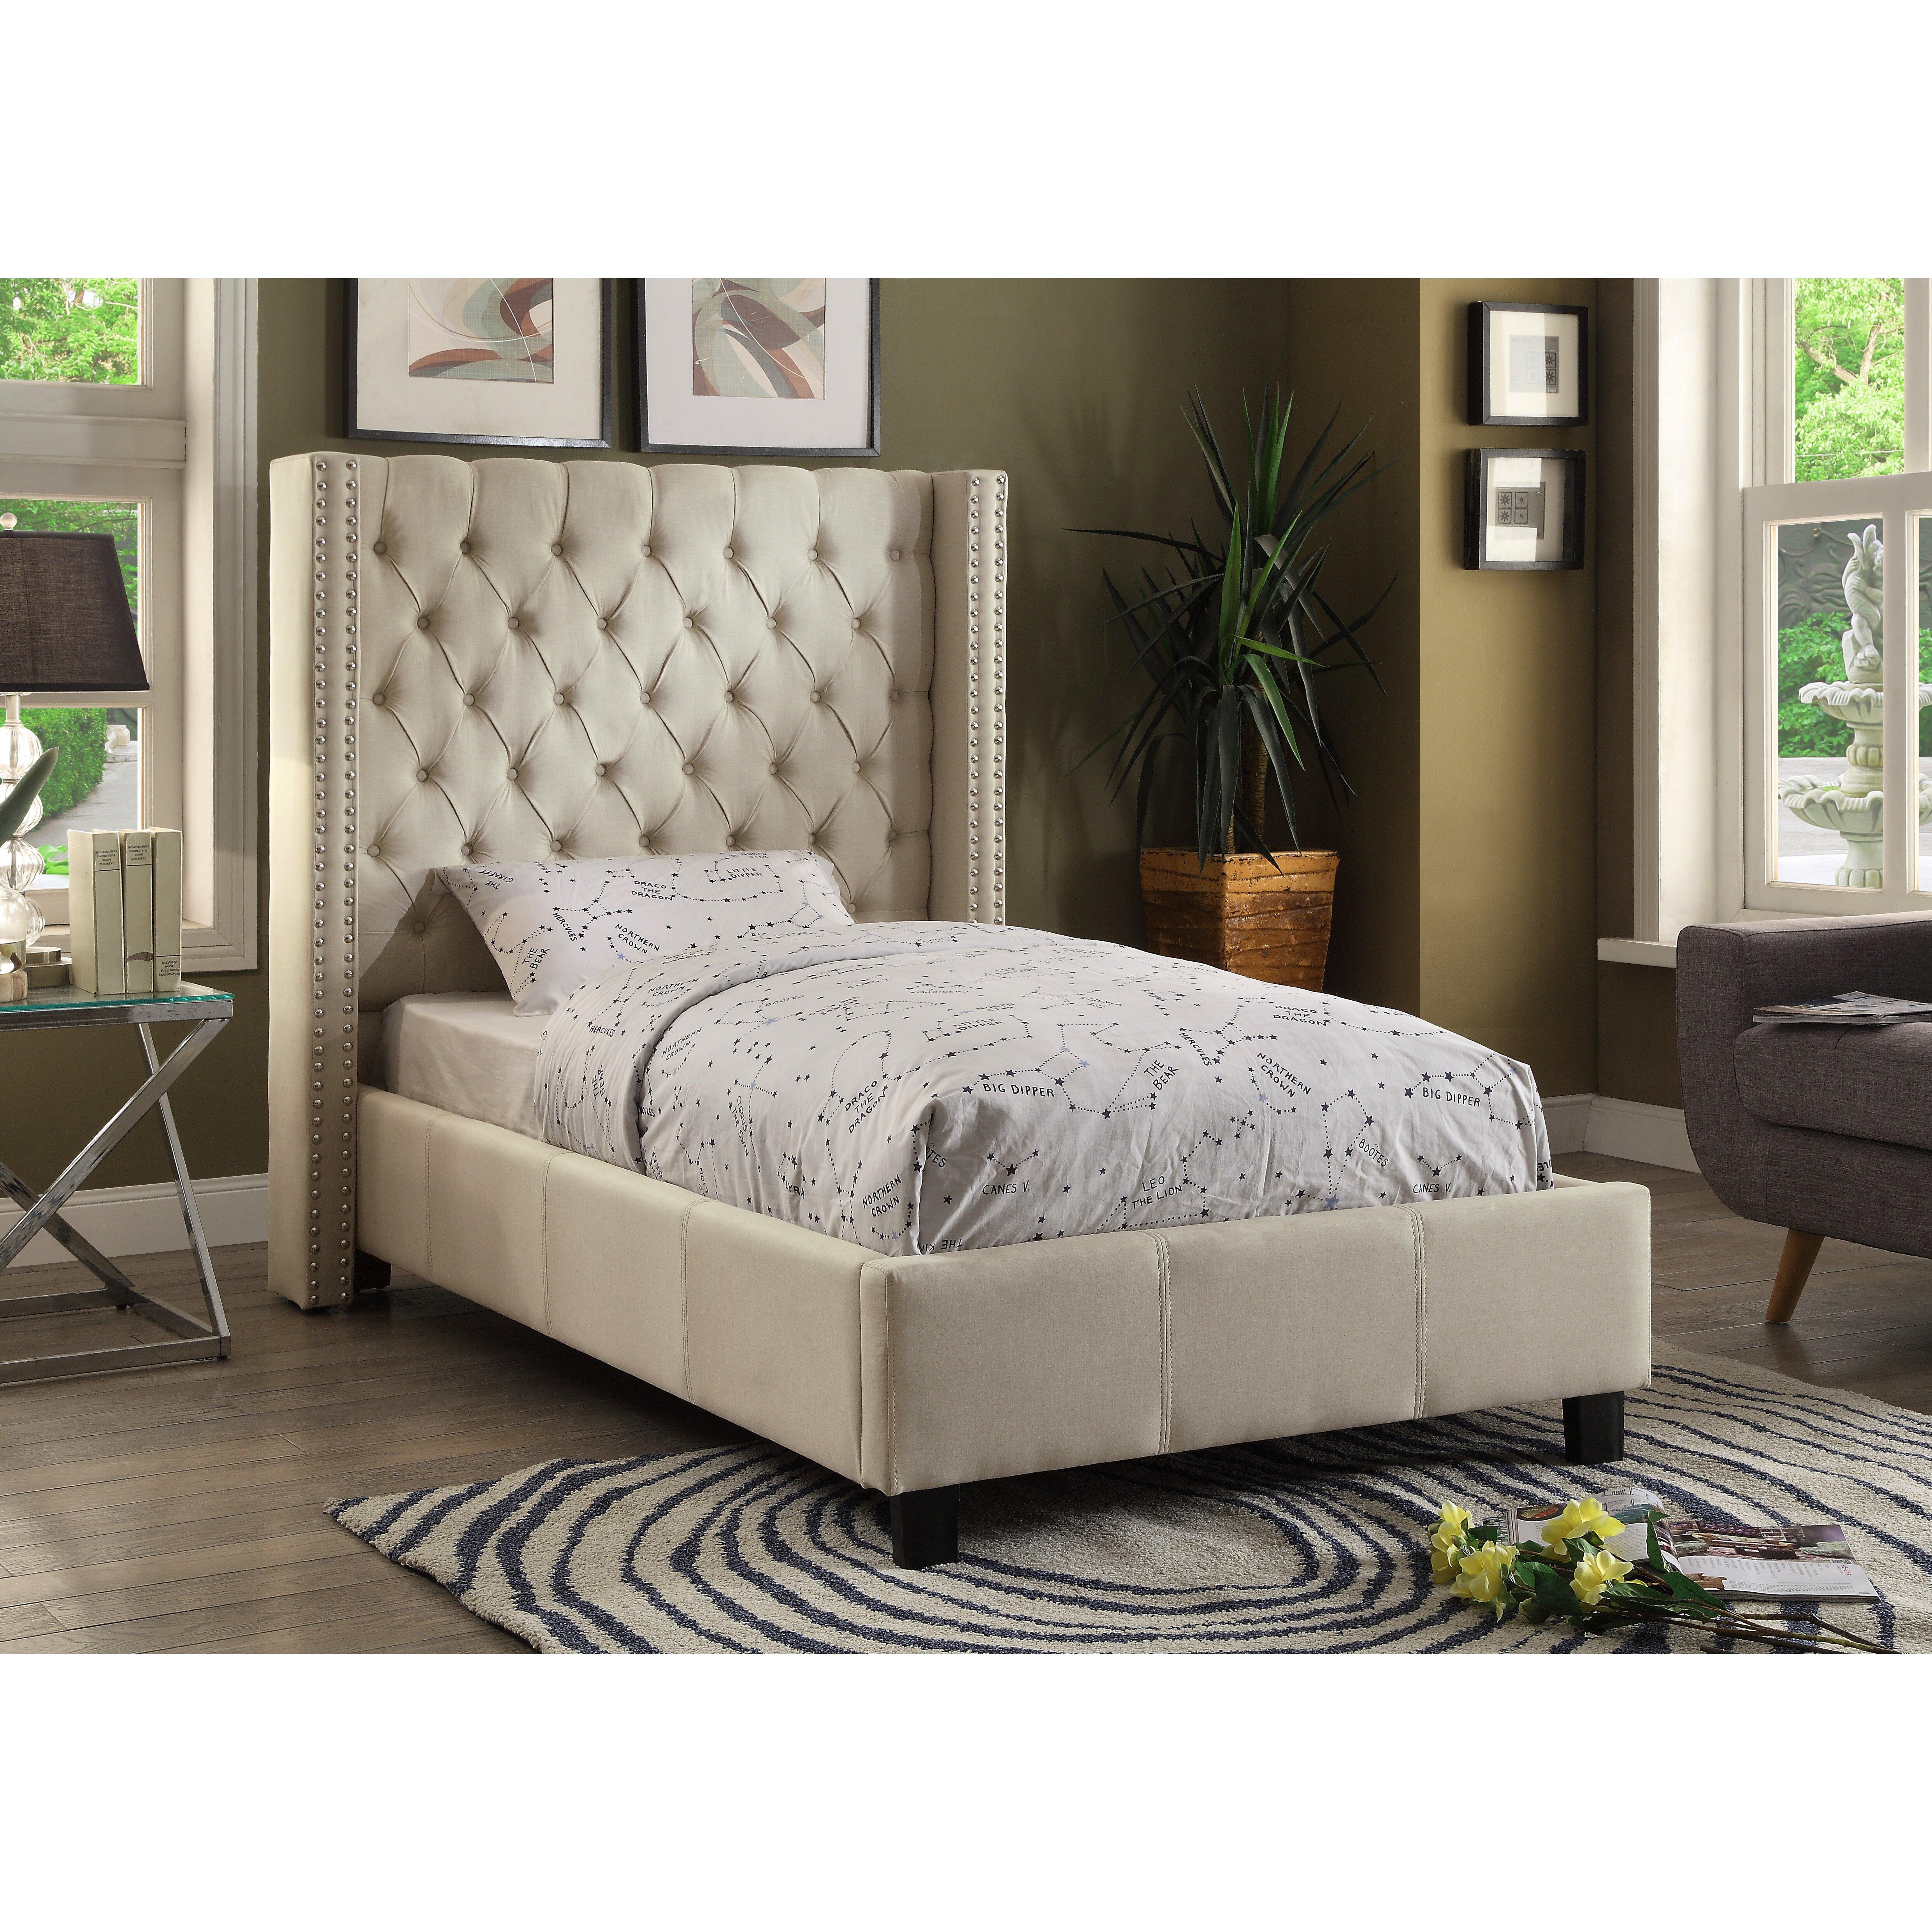 Meridian Furniture Usa Upholstered Platform Bed Reviews Wayfair Supply